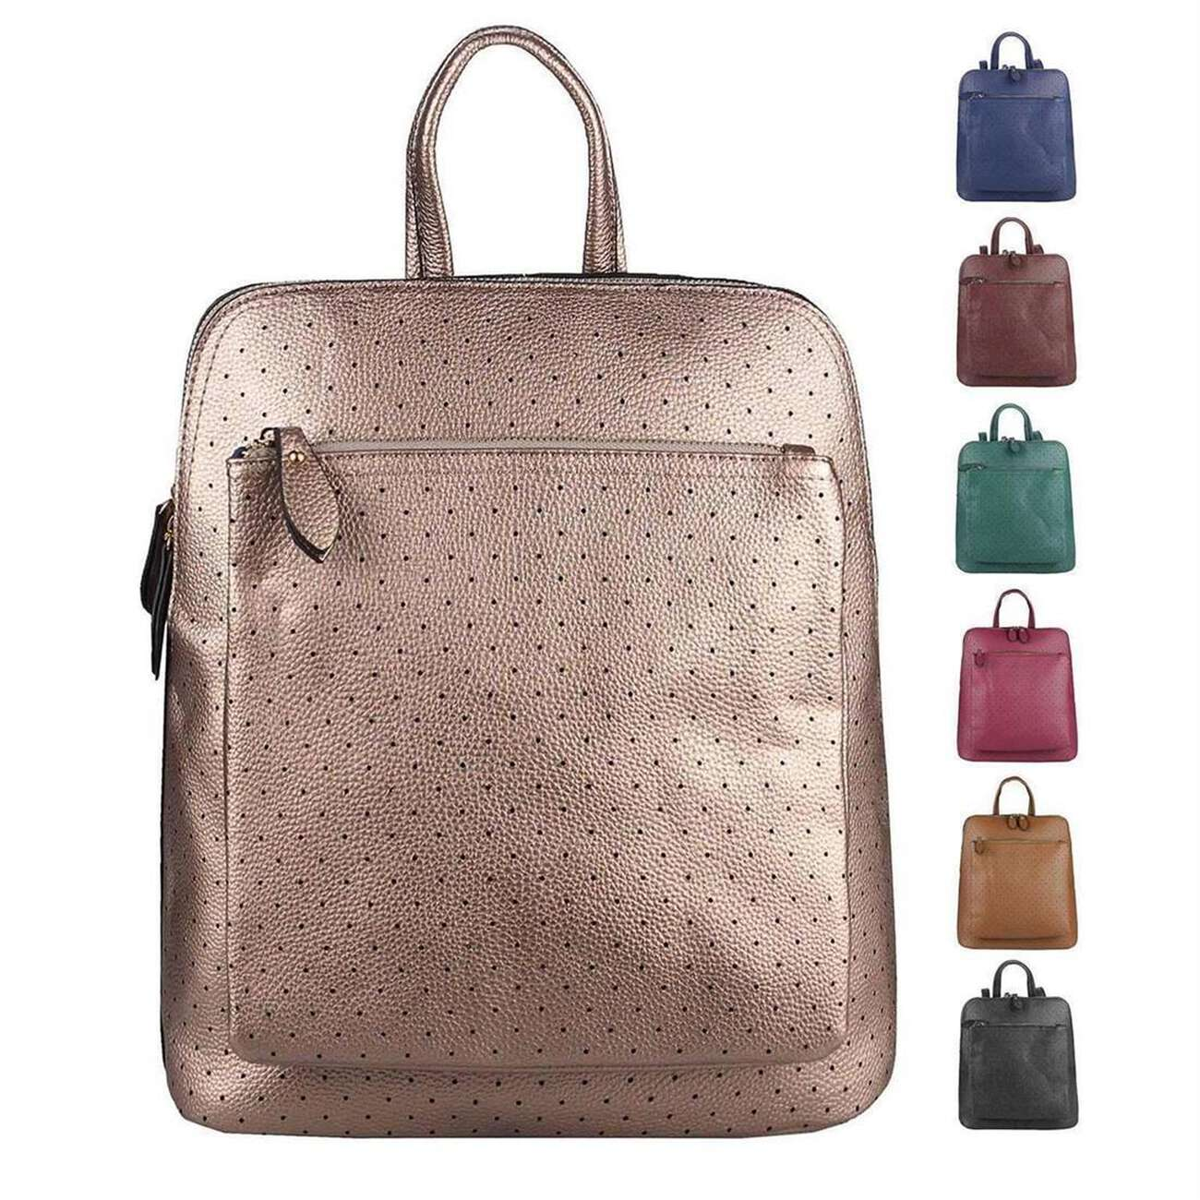 obc damen rucksack tasche backpack cityrucksack stadtrucksack daypack schultertasche handtasche. Black Bedroom Furniture Sets. Home Design Ideas